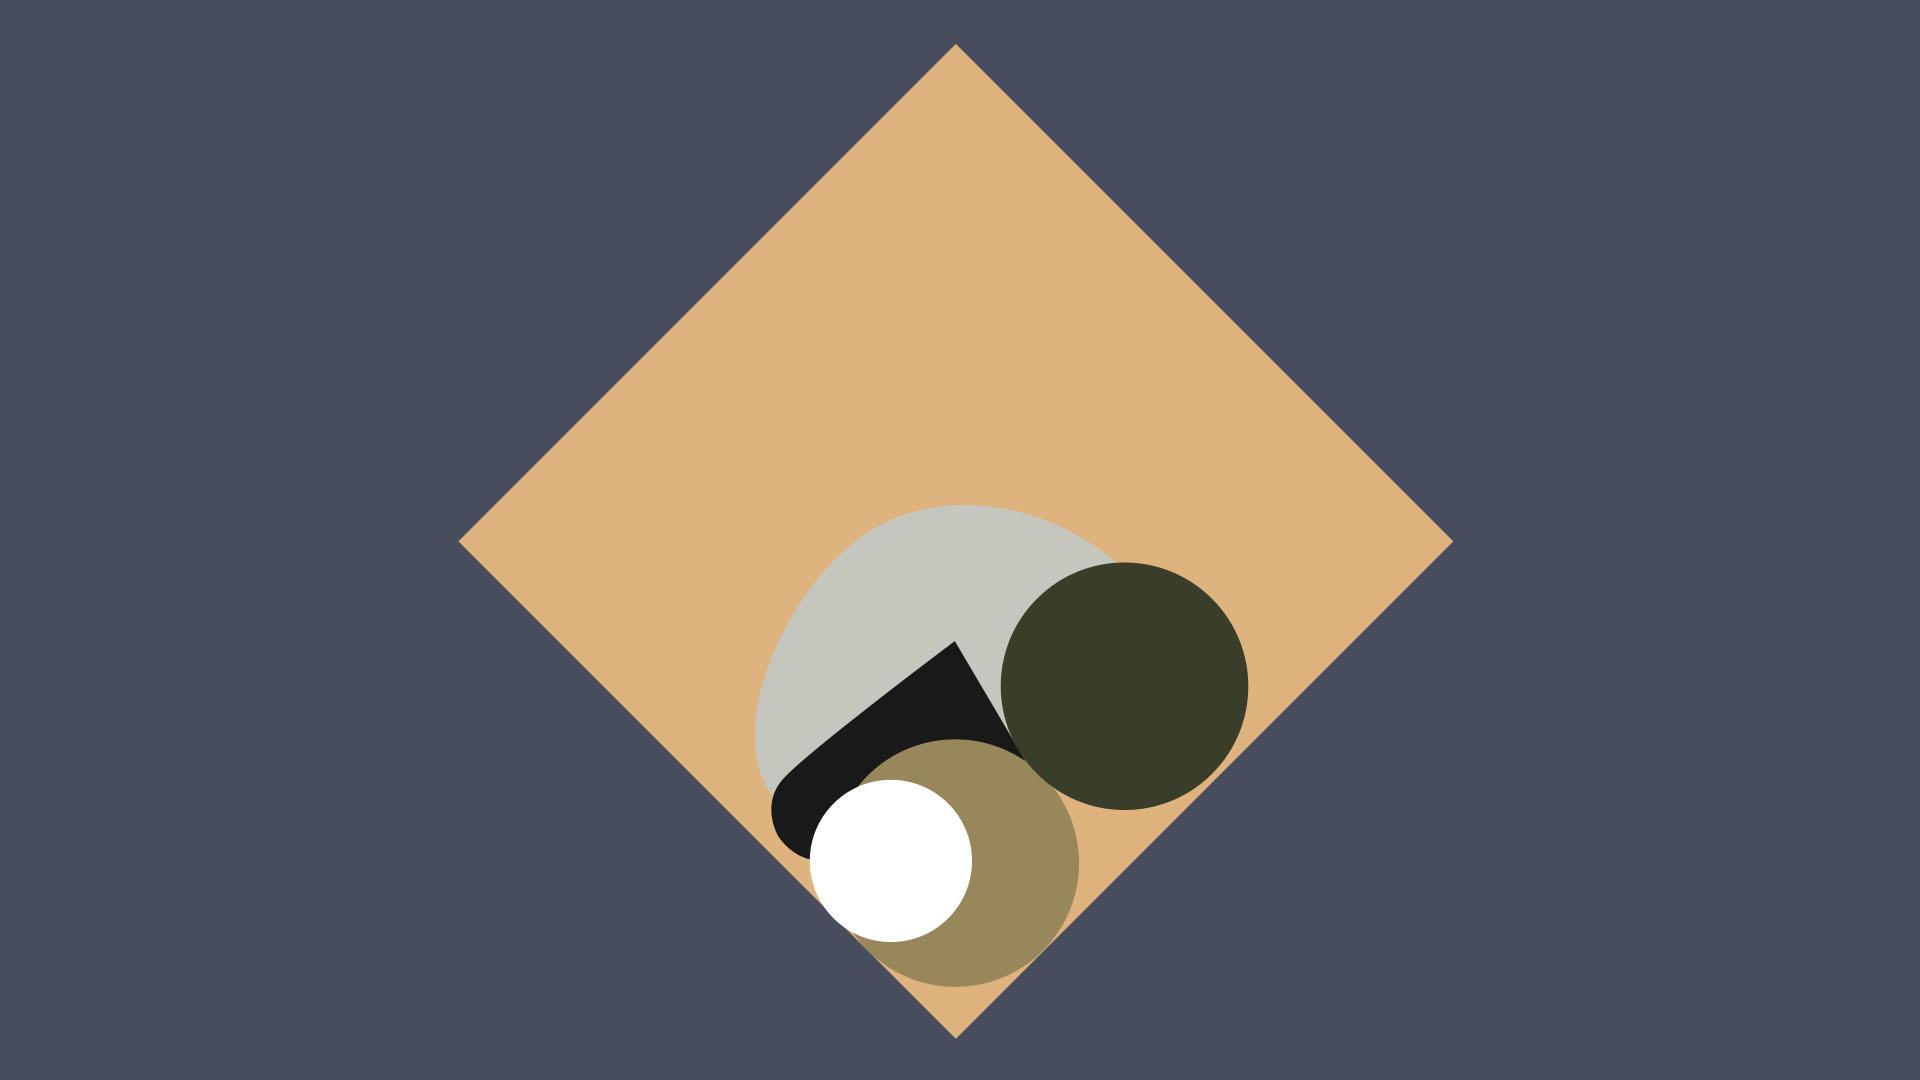 animatique maison corbeille v3_0059_10.jpg